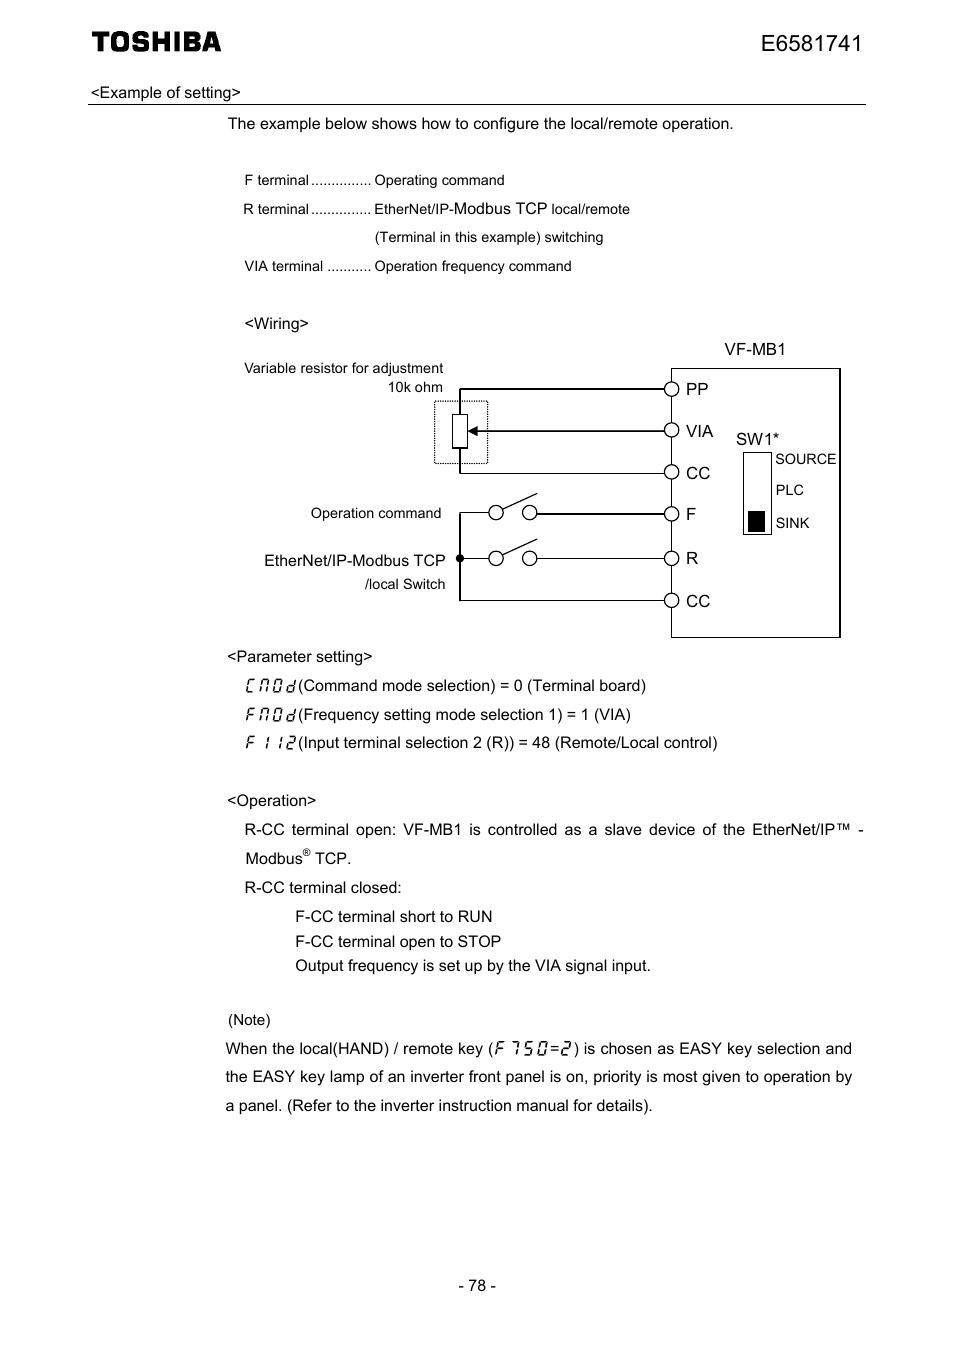 Toshiba Tosvert EtherNet/IP - Modbus TCP option IPE002Z User